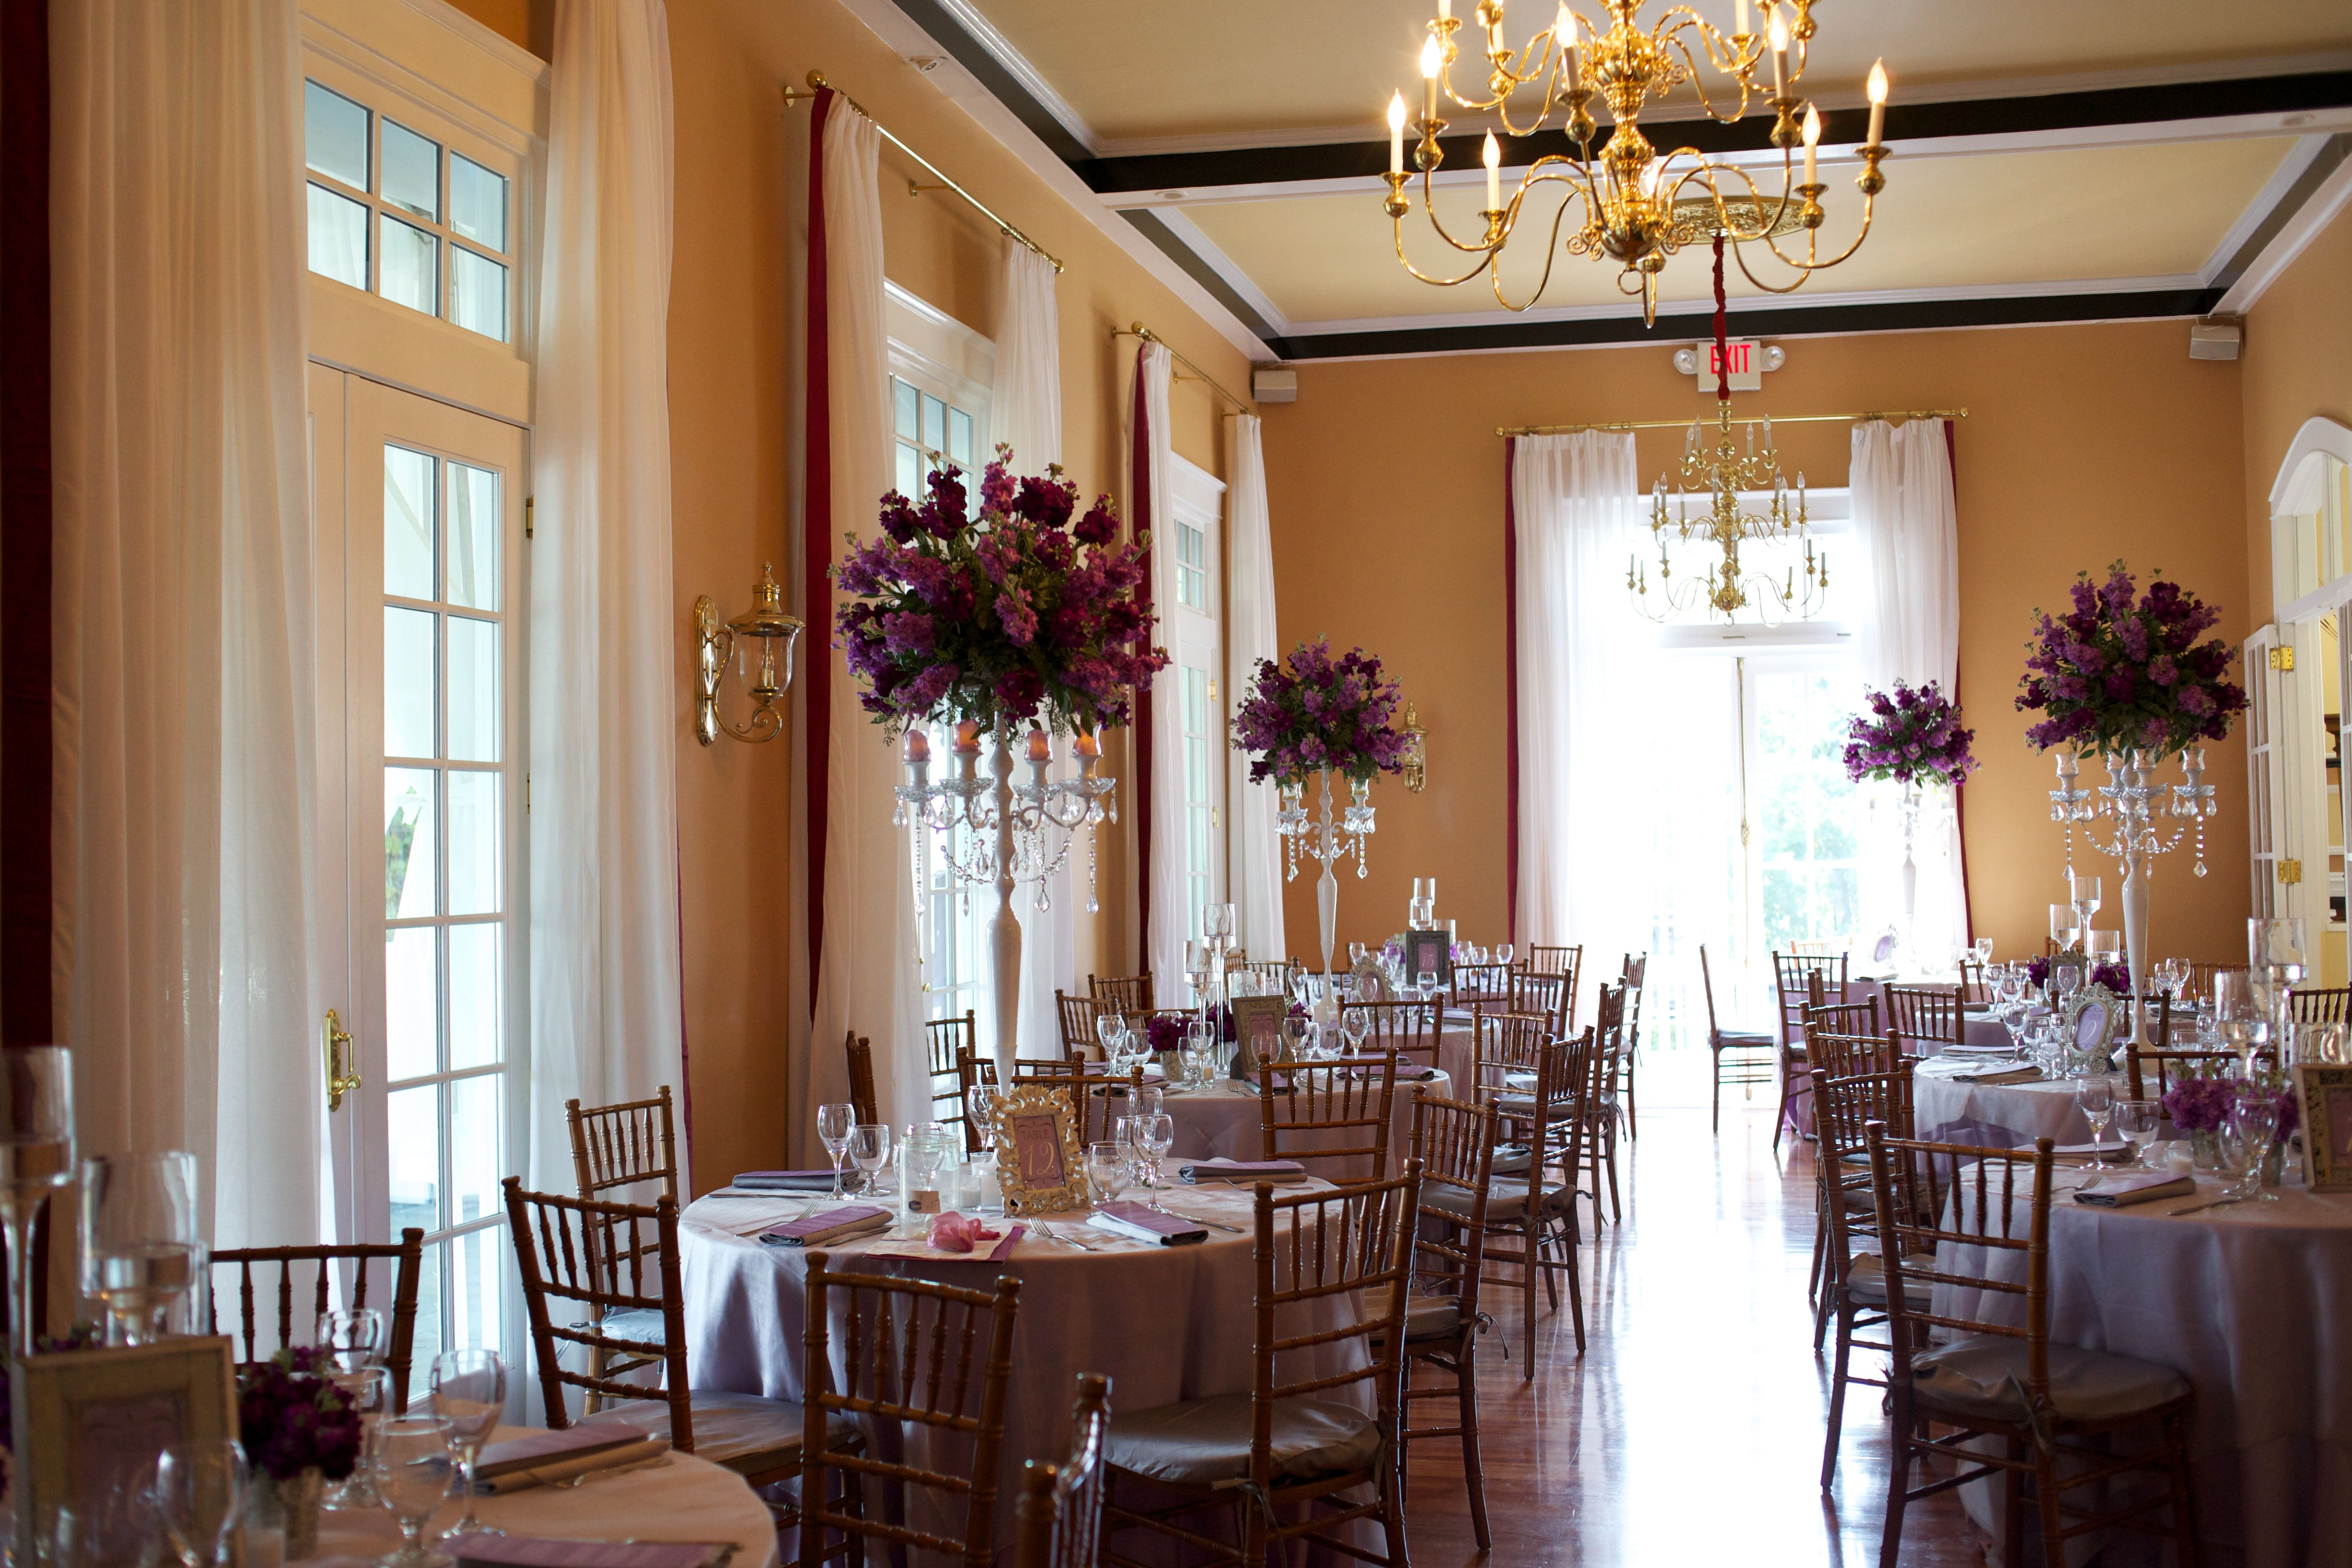 traveler doha room bucket hotel list hyatt dining grand review